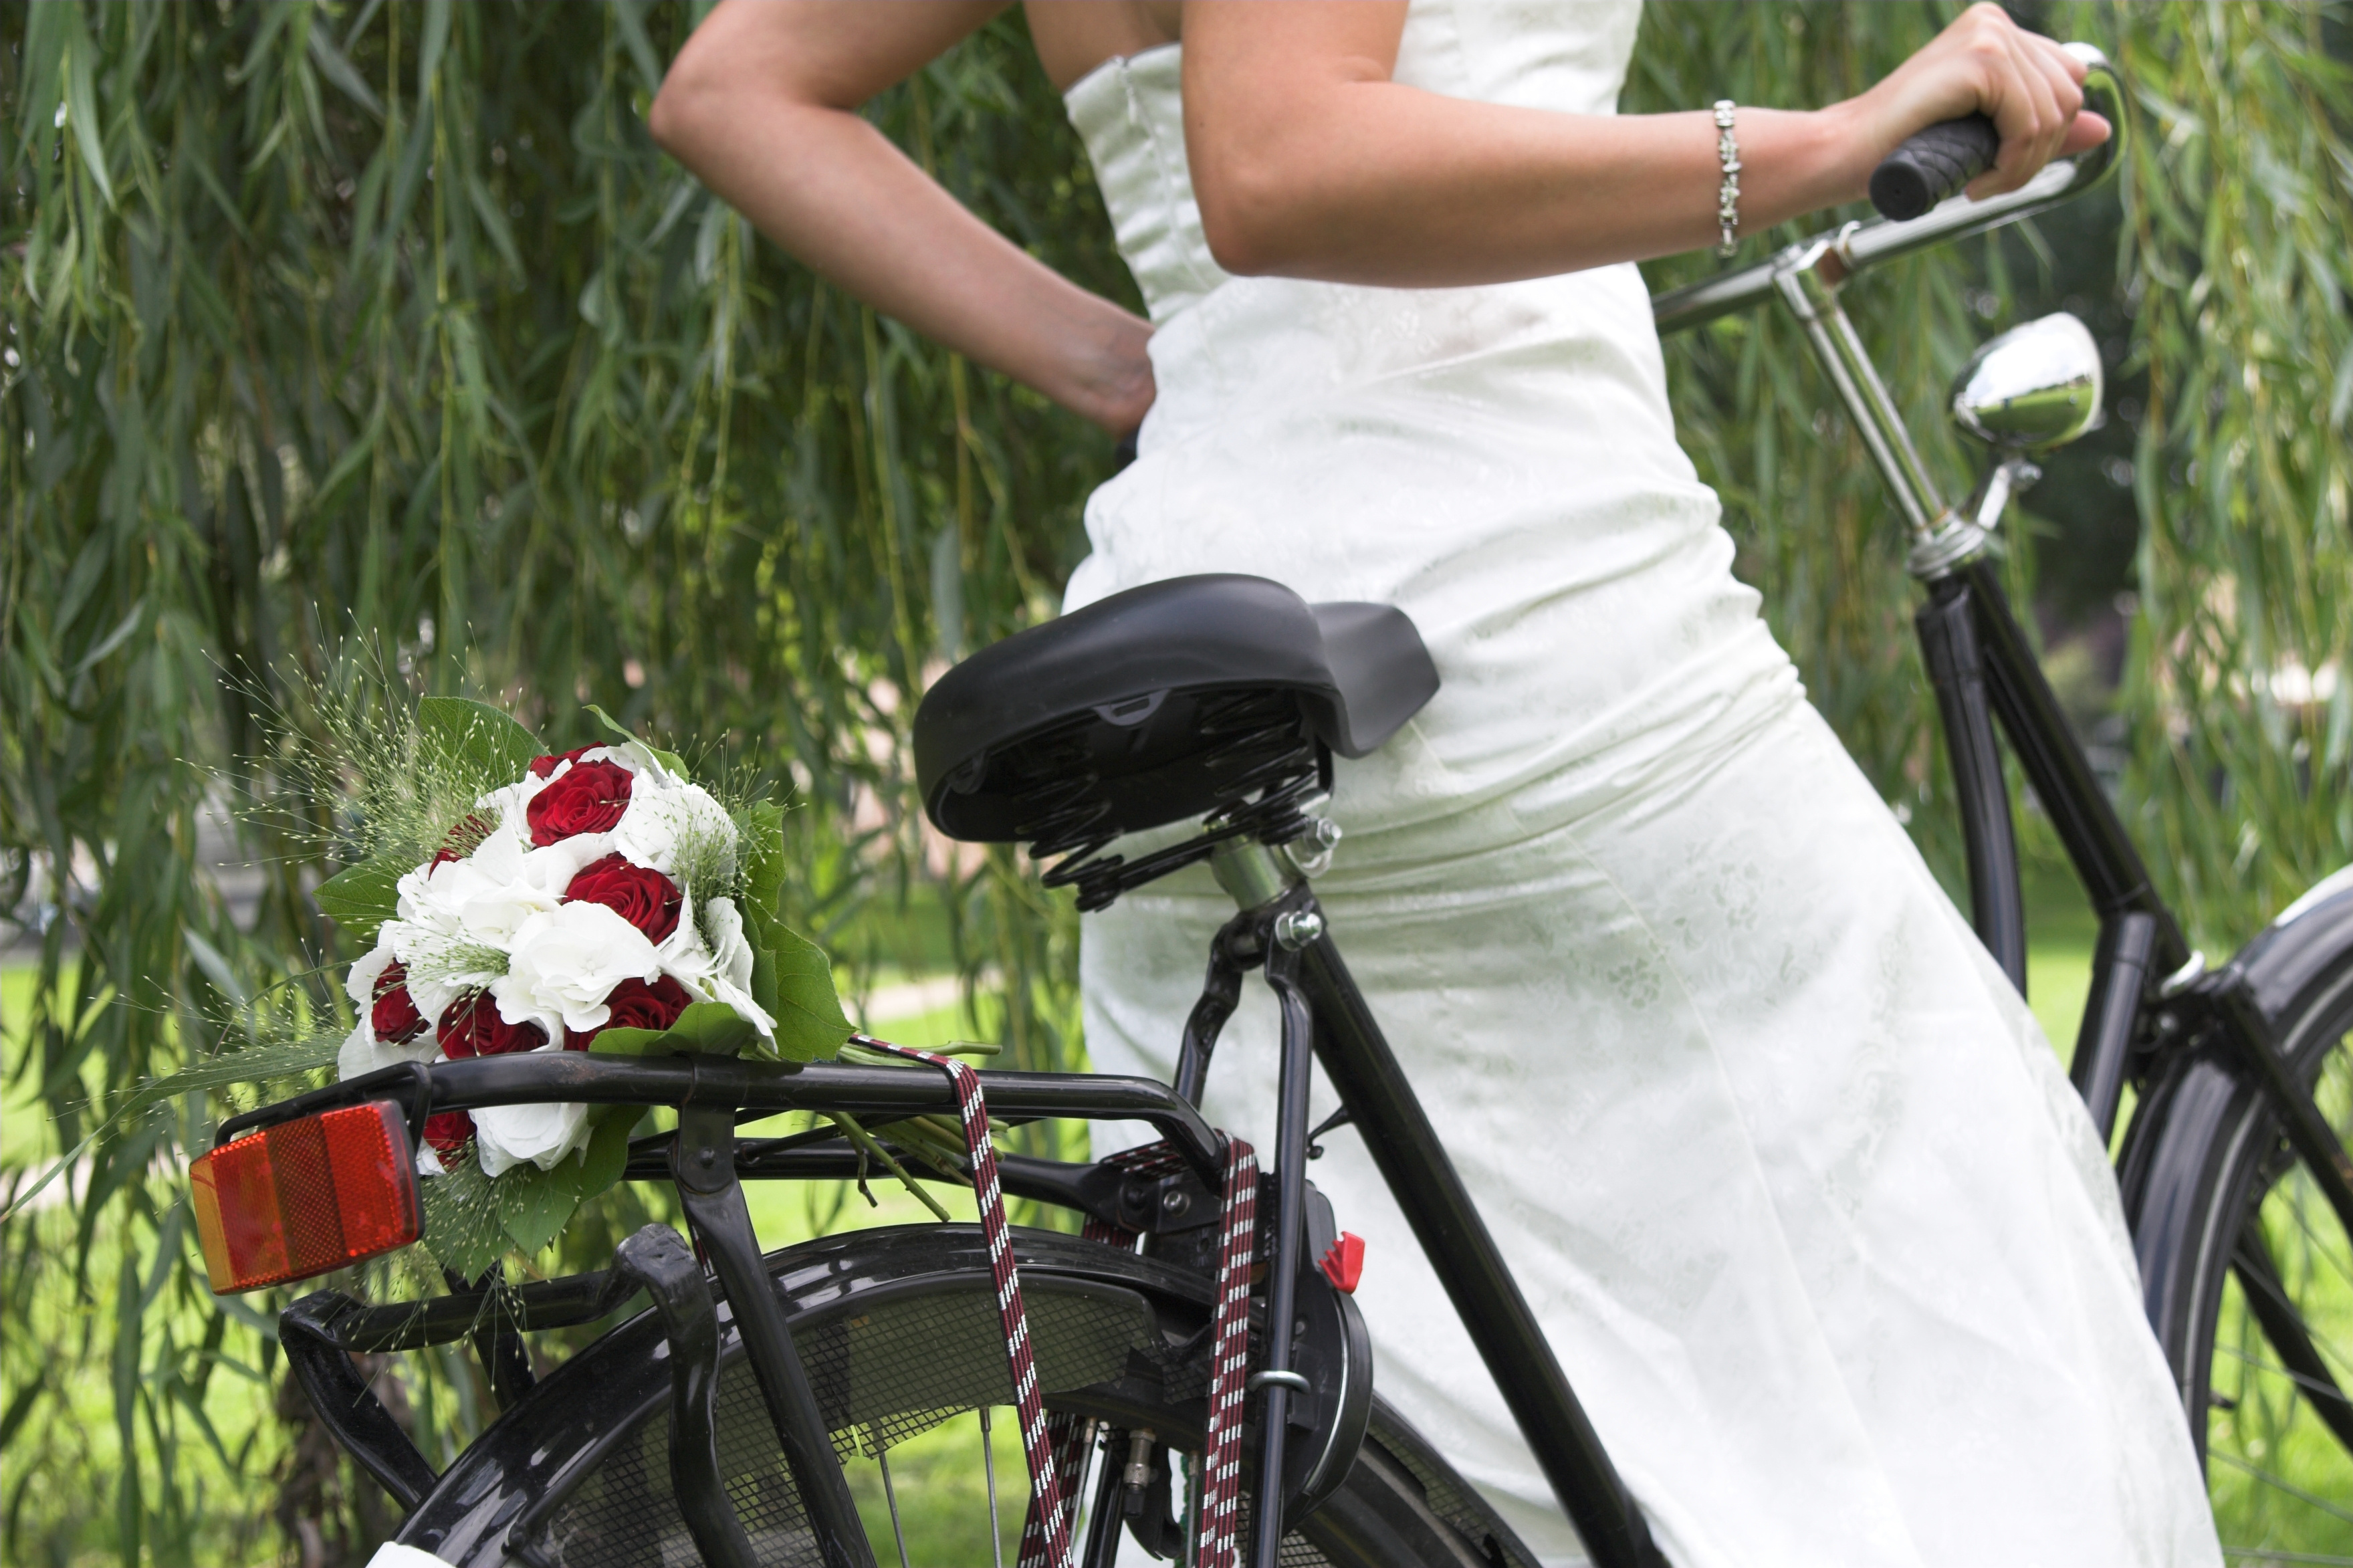 Having fun with wedding photography - Pose photo mariage ...